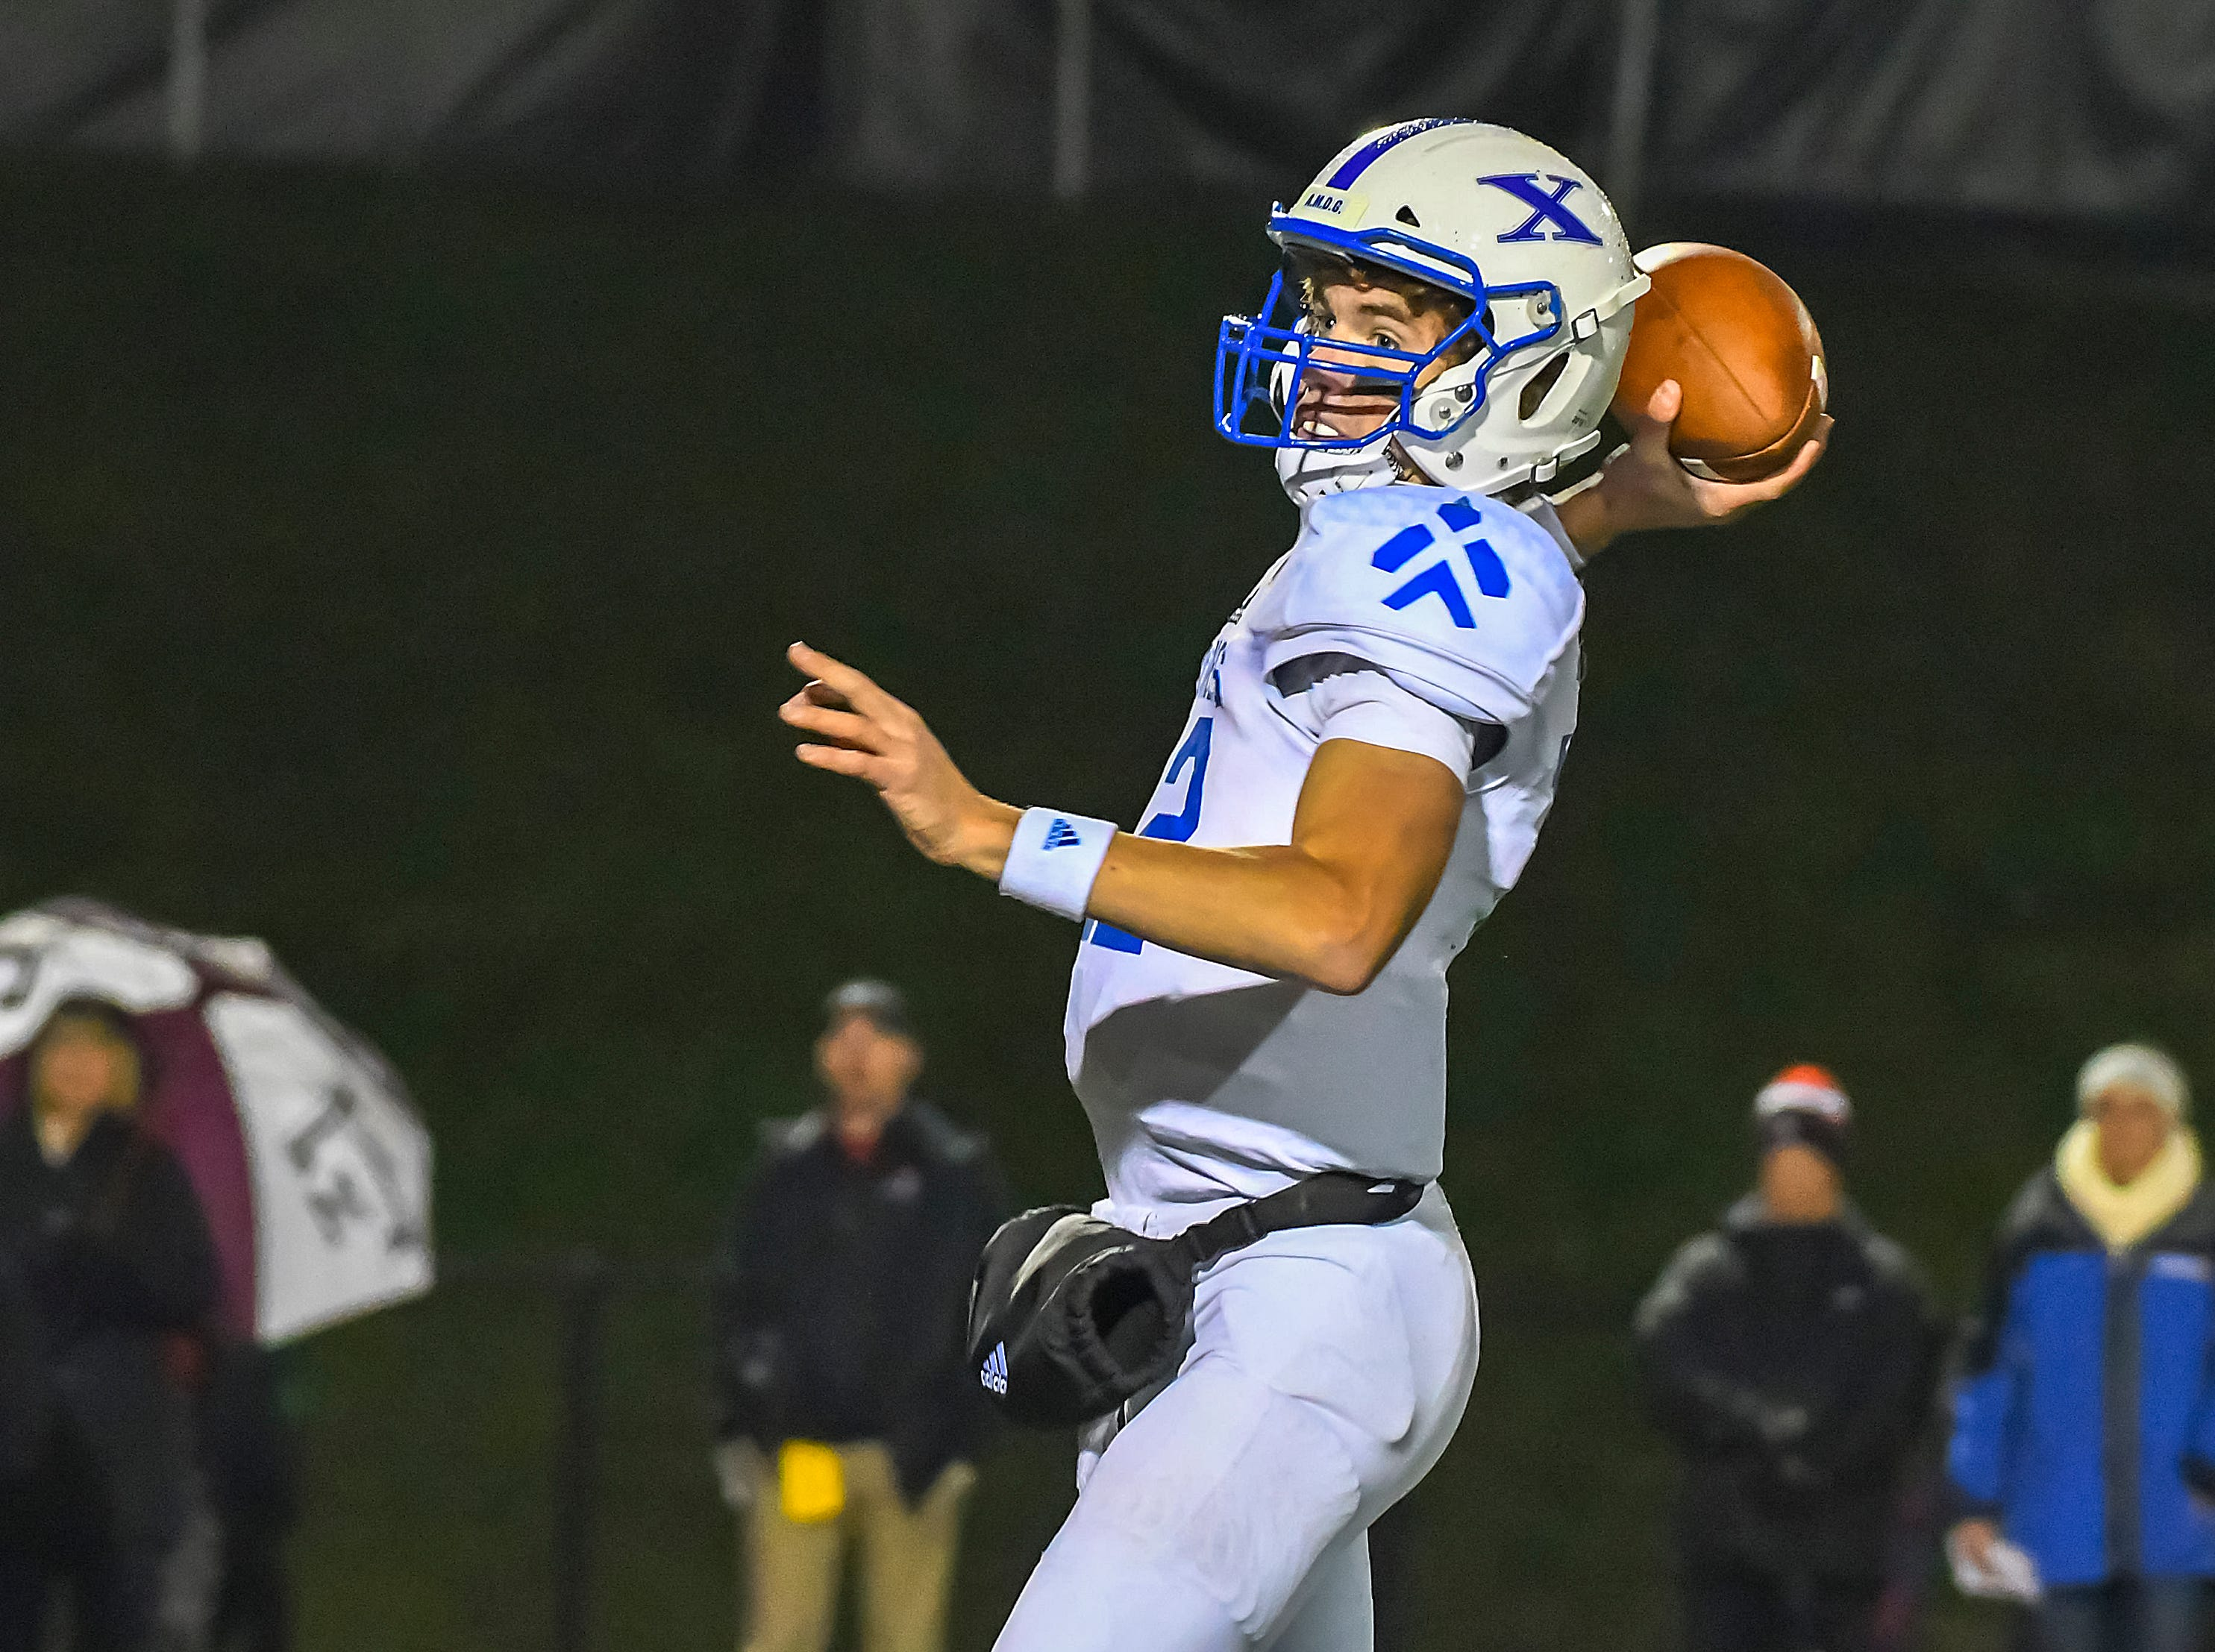 St. X quarterback Matthew Rueve attempts a pass against Colerain in the OHSAA DI Region 4 Playoffs at Colerain High School,  Friday Nov. 2, 2018